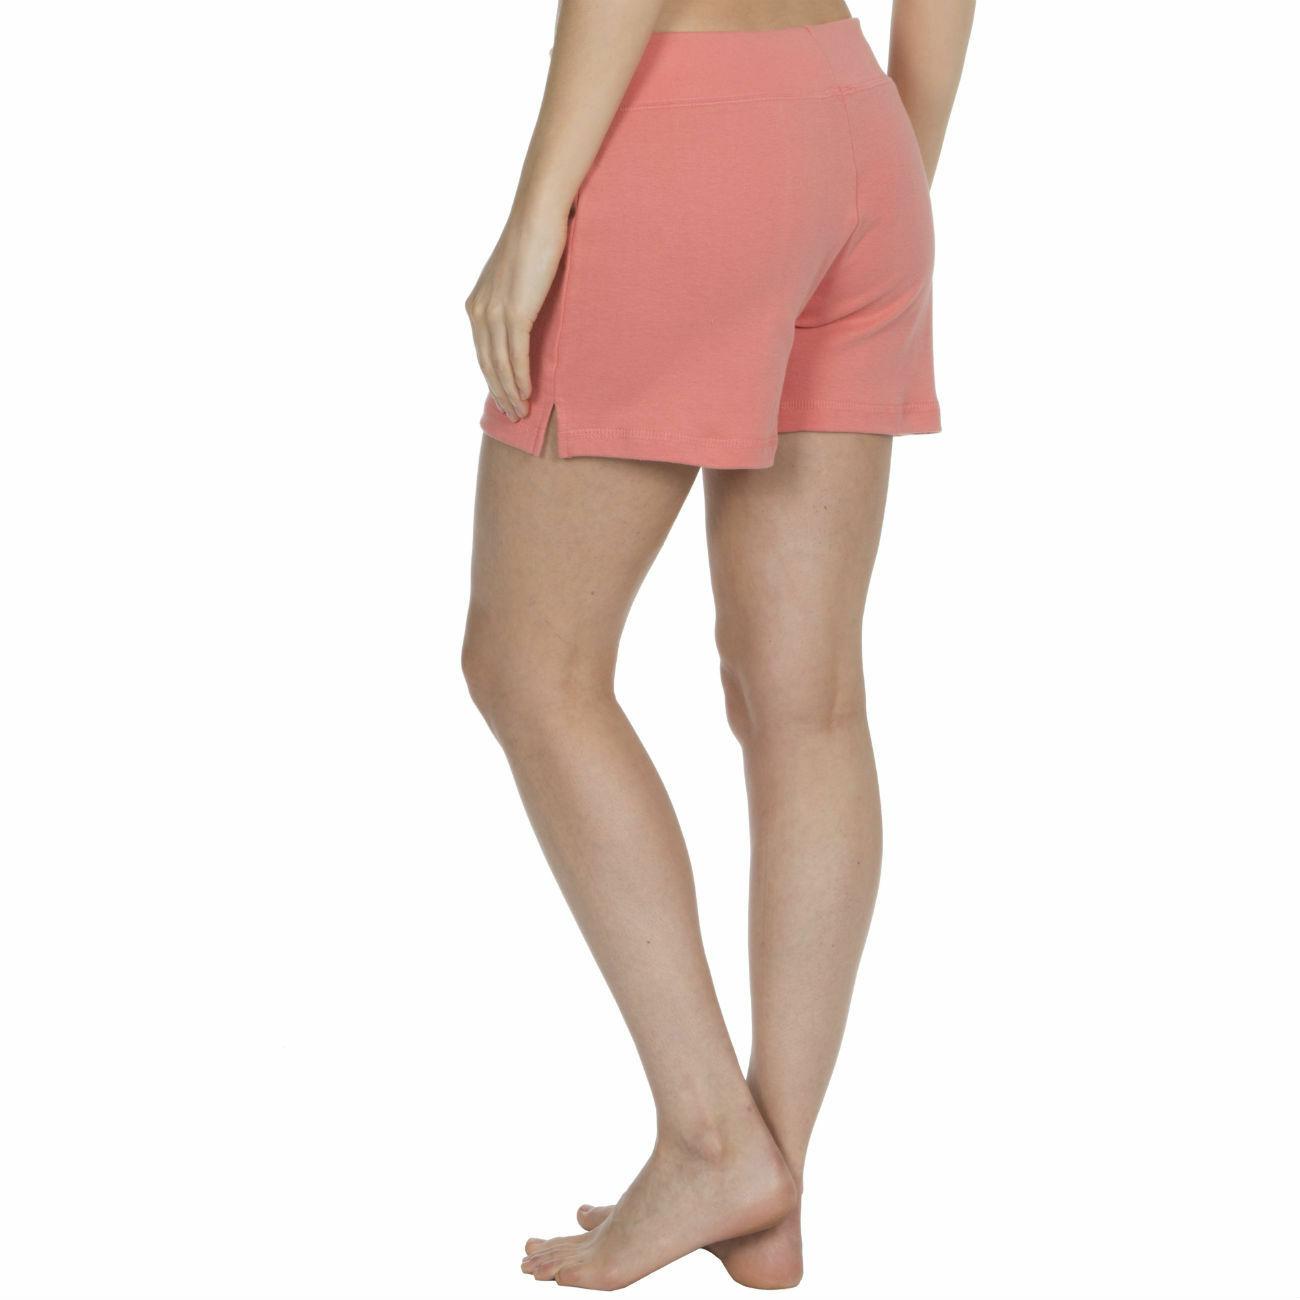 Womens-Cotton-Jersey-Shorts-Elastic-Waist-Summer-Beach-Casual-Yoga-Hot-Pants-New thumbnail 37